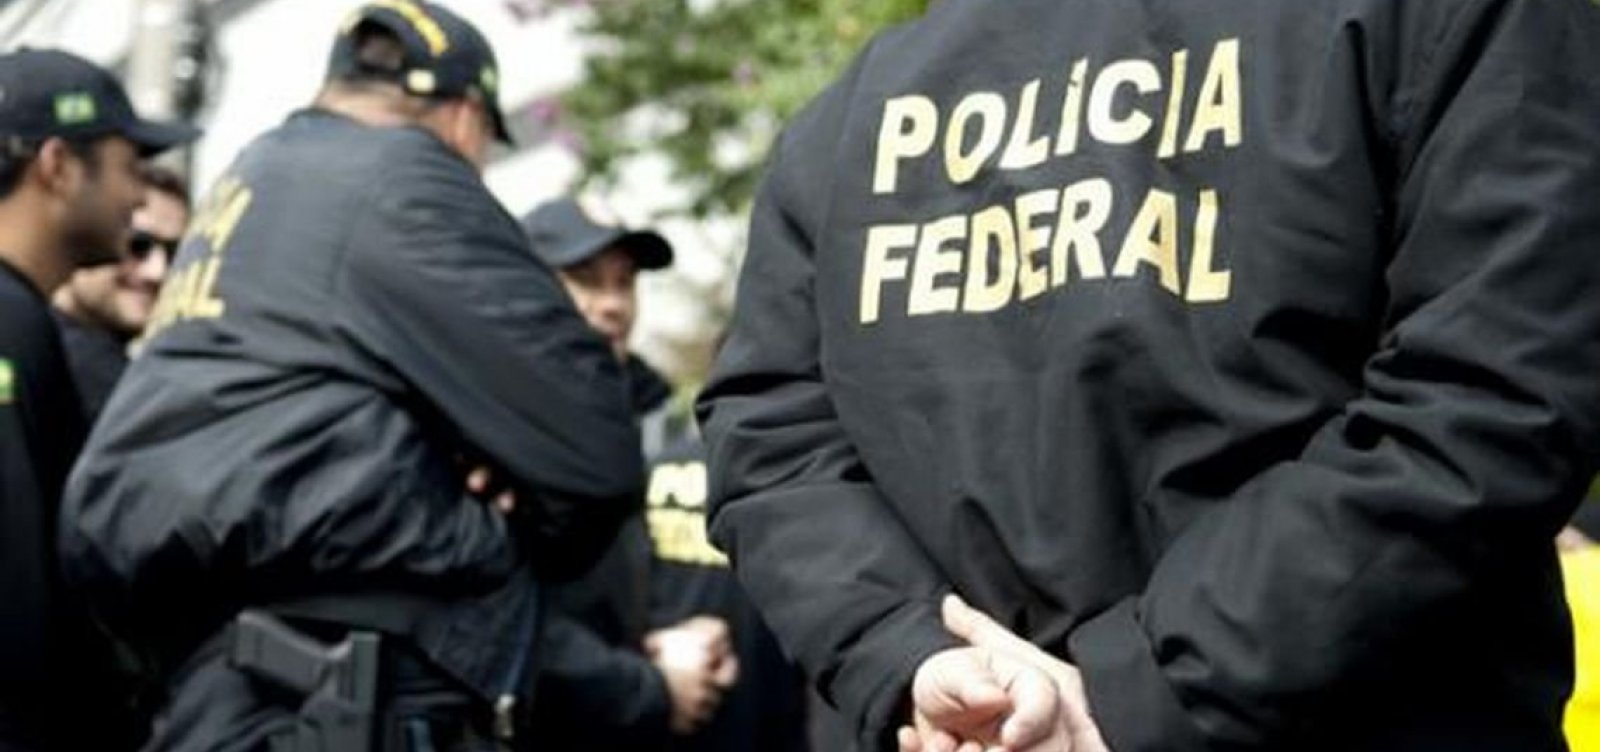 [PF investiga 1.659 crimes eleitorais e confiscou R$ 10,7 mi]